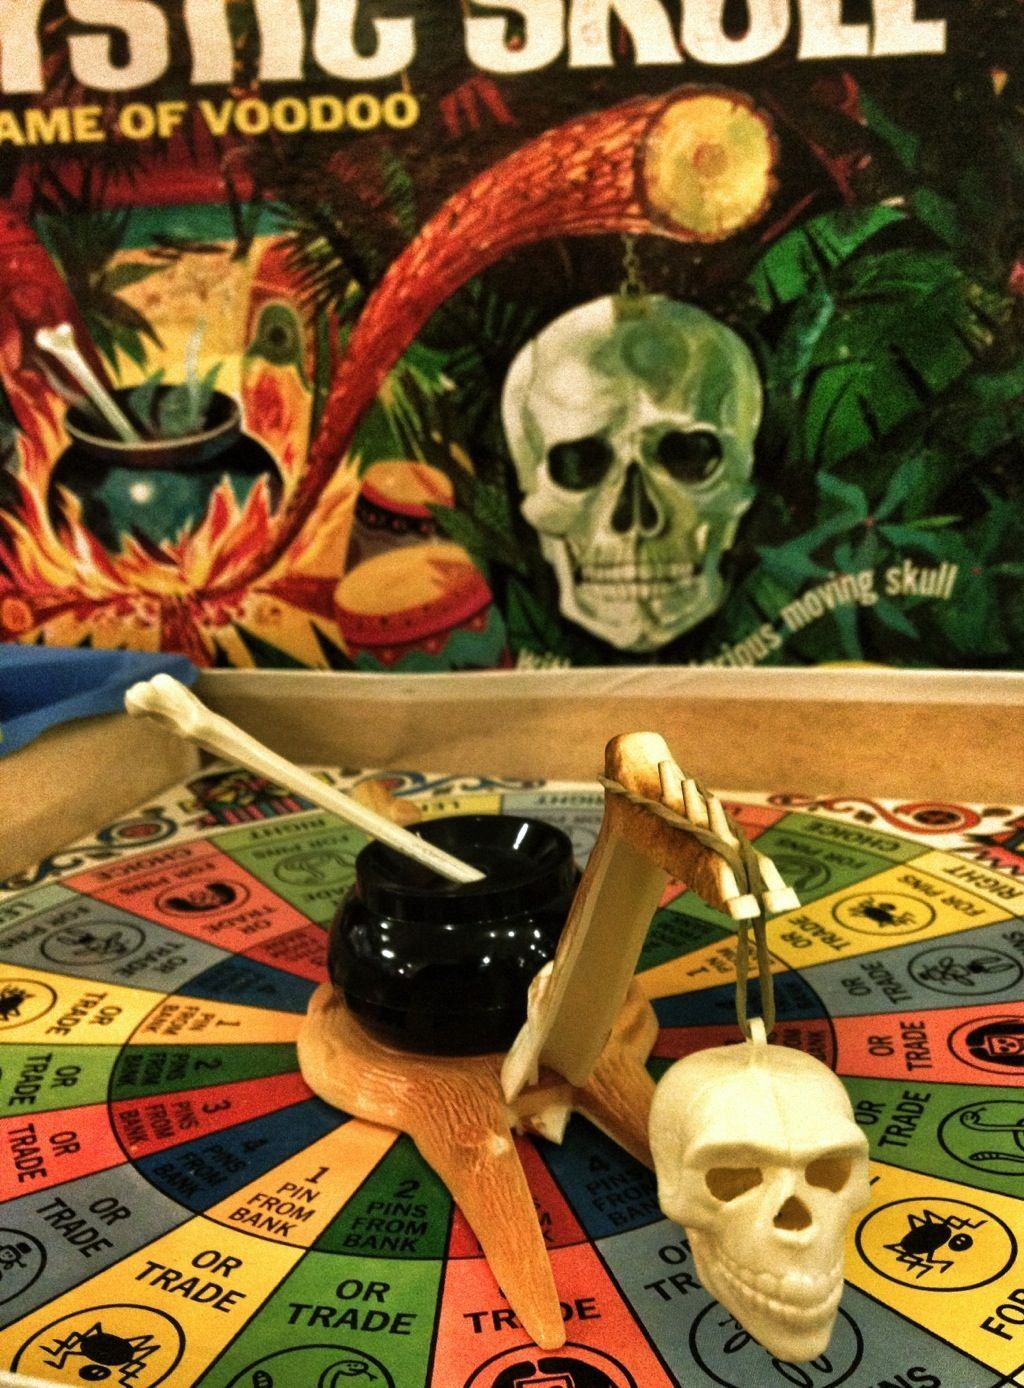 Mystic Skull board game, 1960s Board games, Vintage